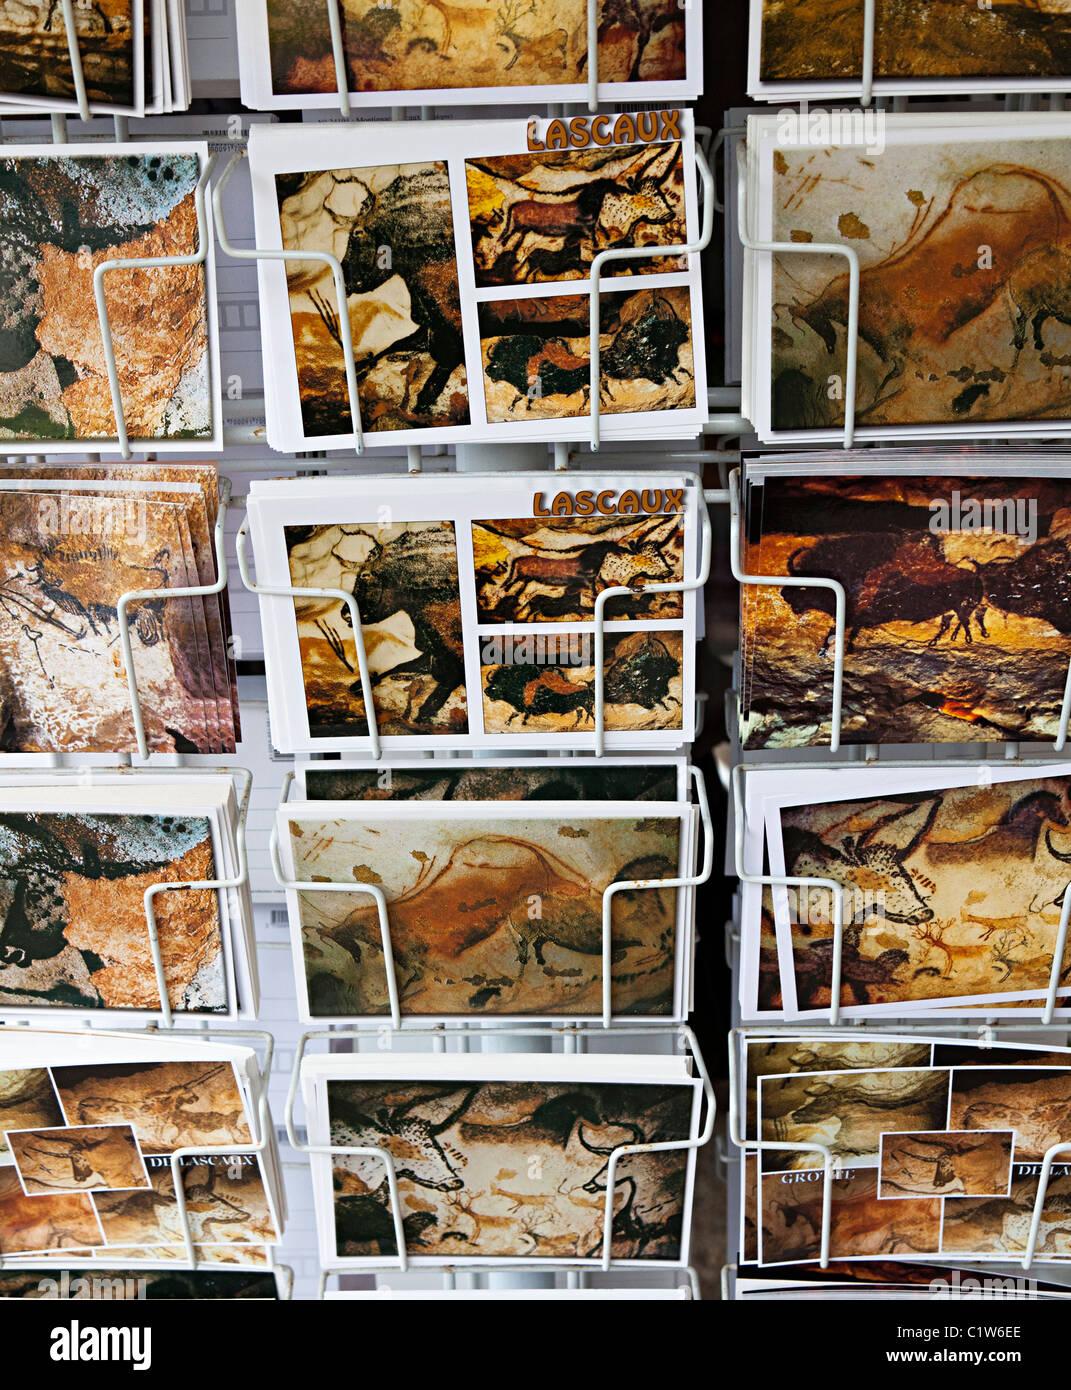 Palaeolithic cave art postcards on sale Montignac Dordogne France Stock Photo